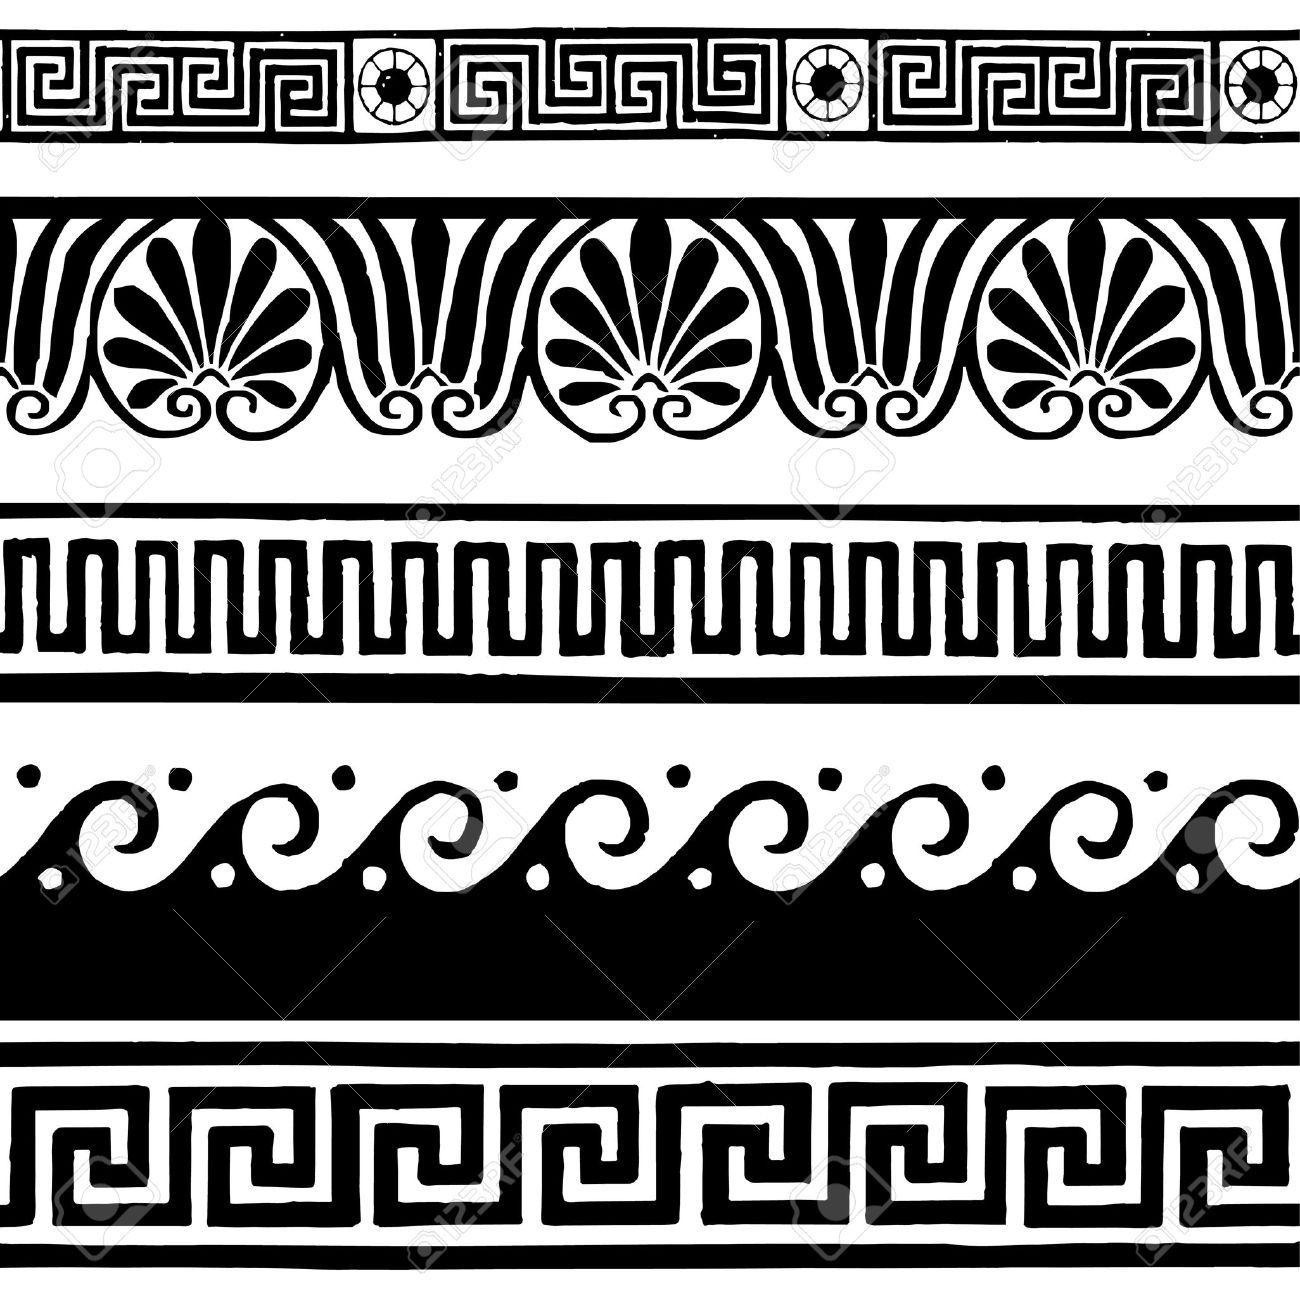 34329437 Greek Style Seamless Borders Hand Drawing Stock Vector Greek Ancient Frieze Jpg 1 300 1 294 Pixels Pattern Tattoo Greek Pattern Tribal Pattern Tattoos